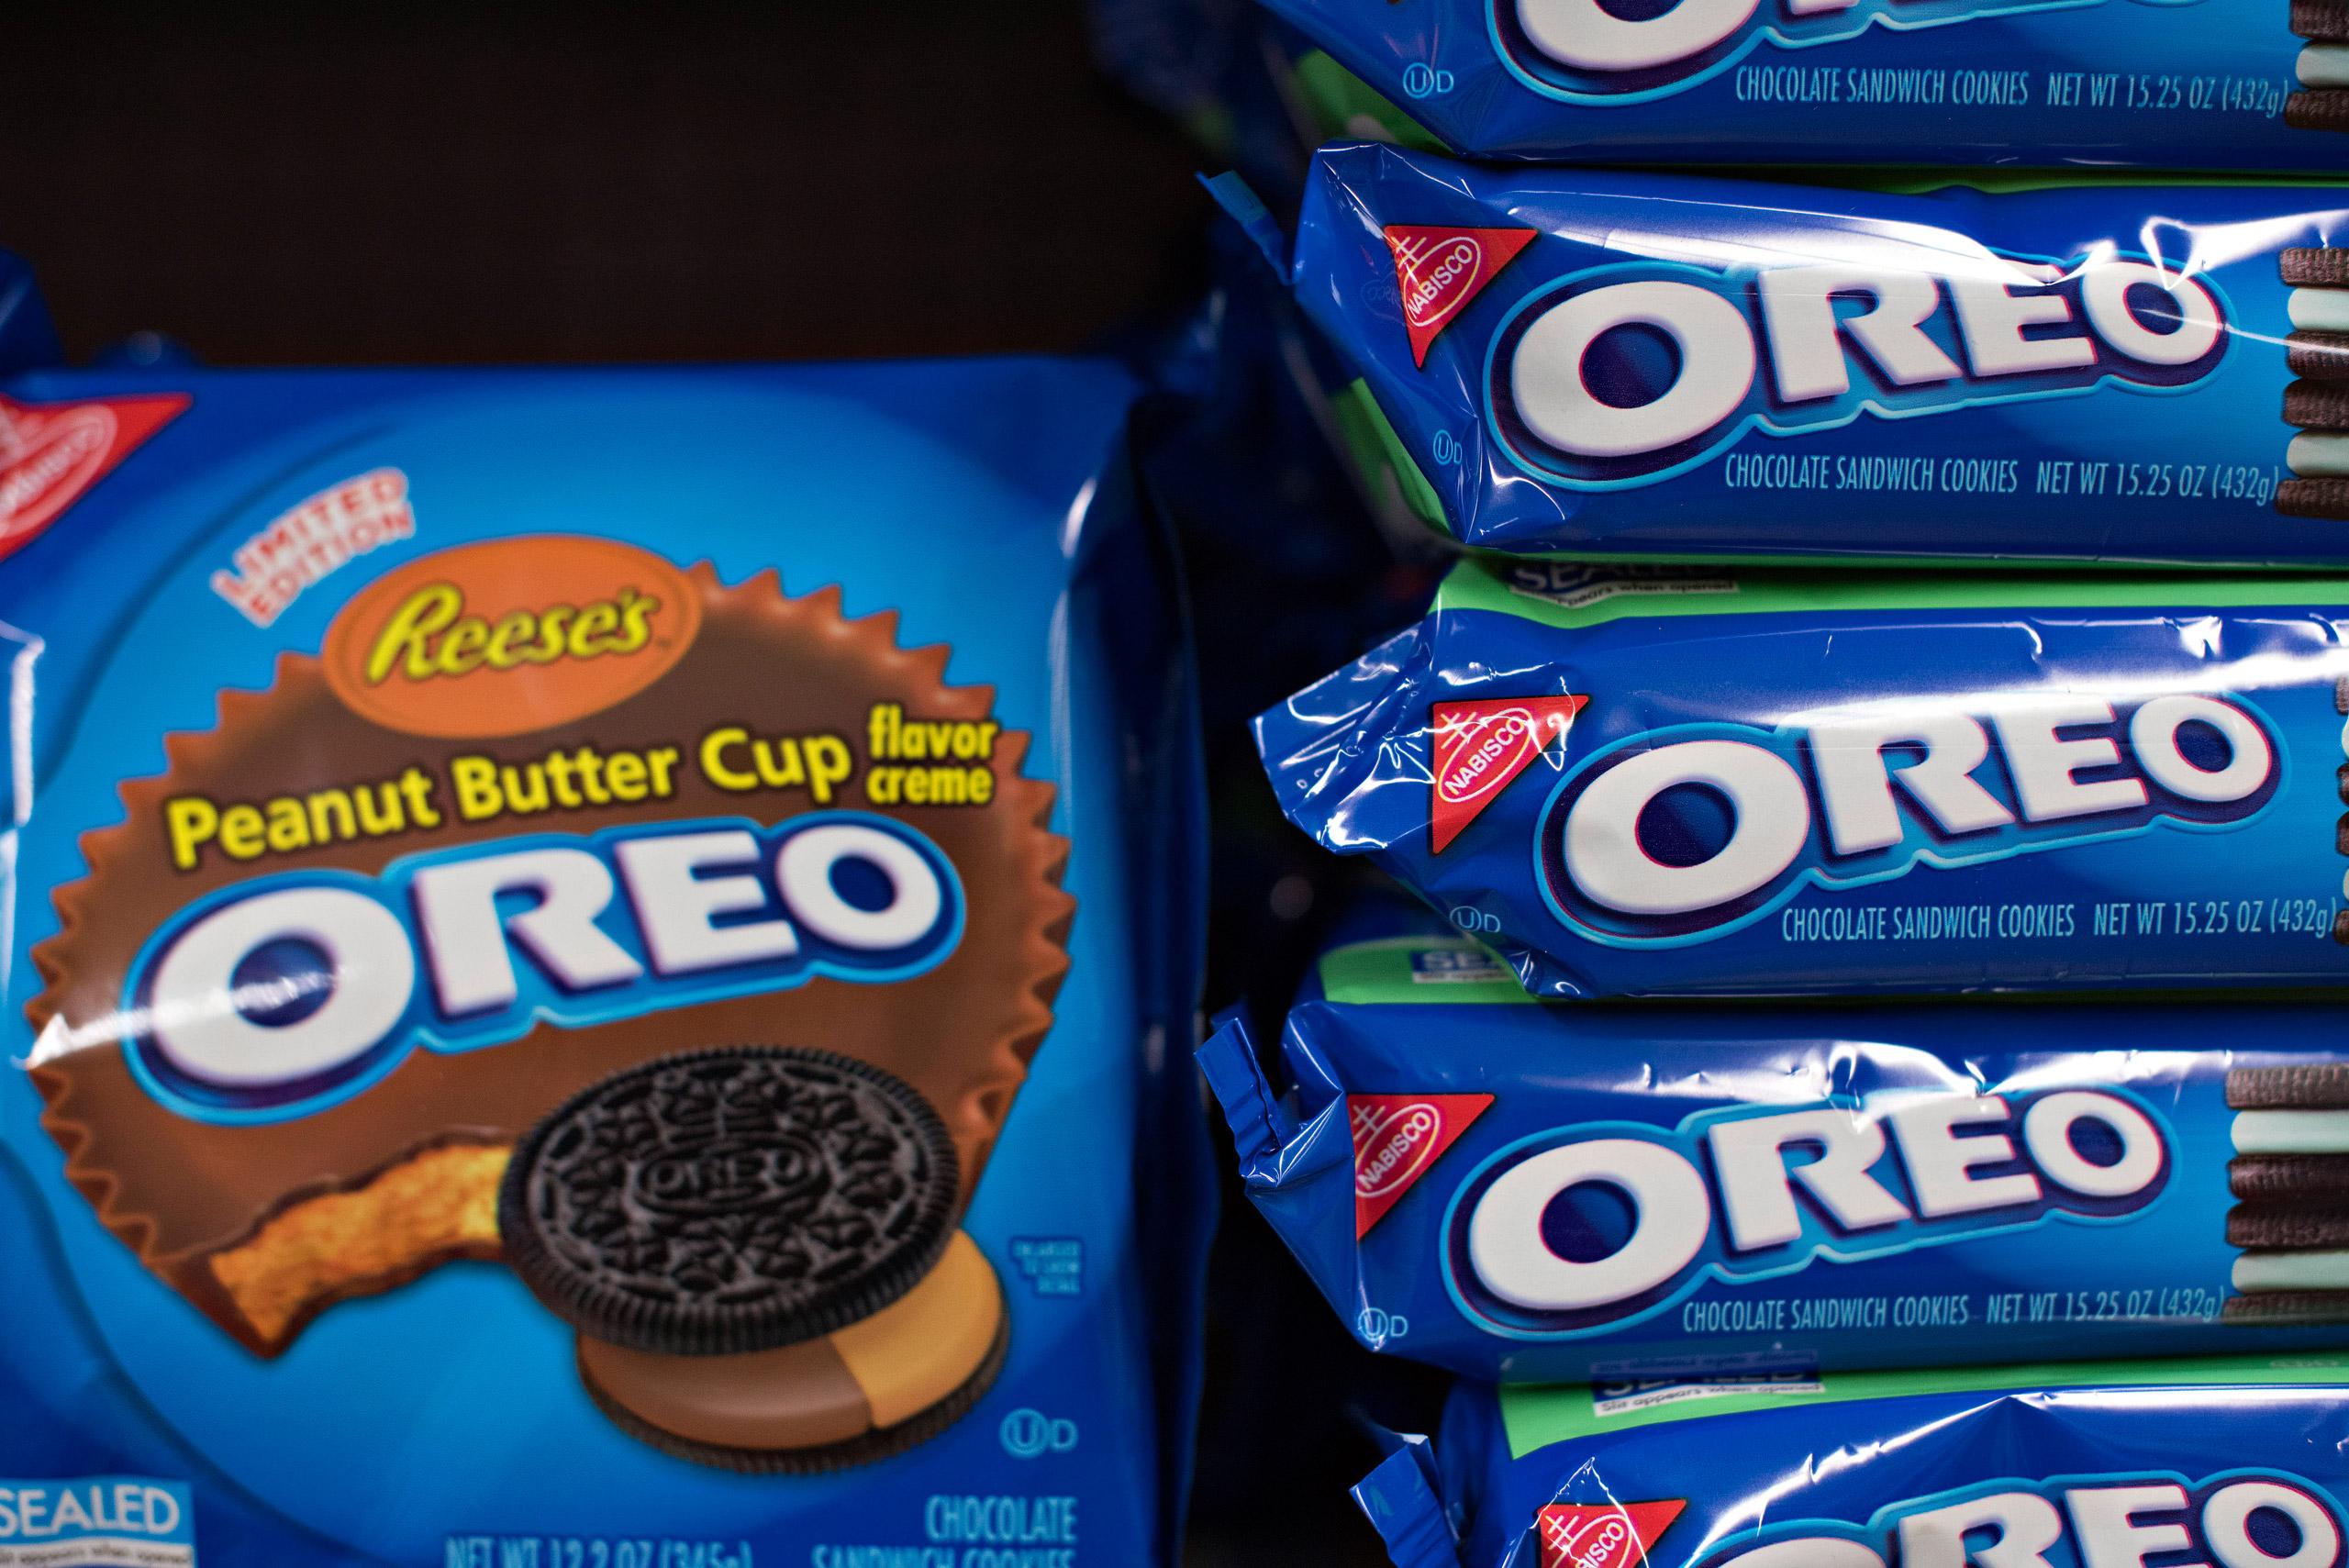 Mondelez International Inc. Oreo brand cookies sit on a supermarket shelf in Princeton, Ill., on Apr. 1, 2015.